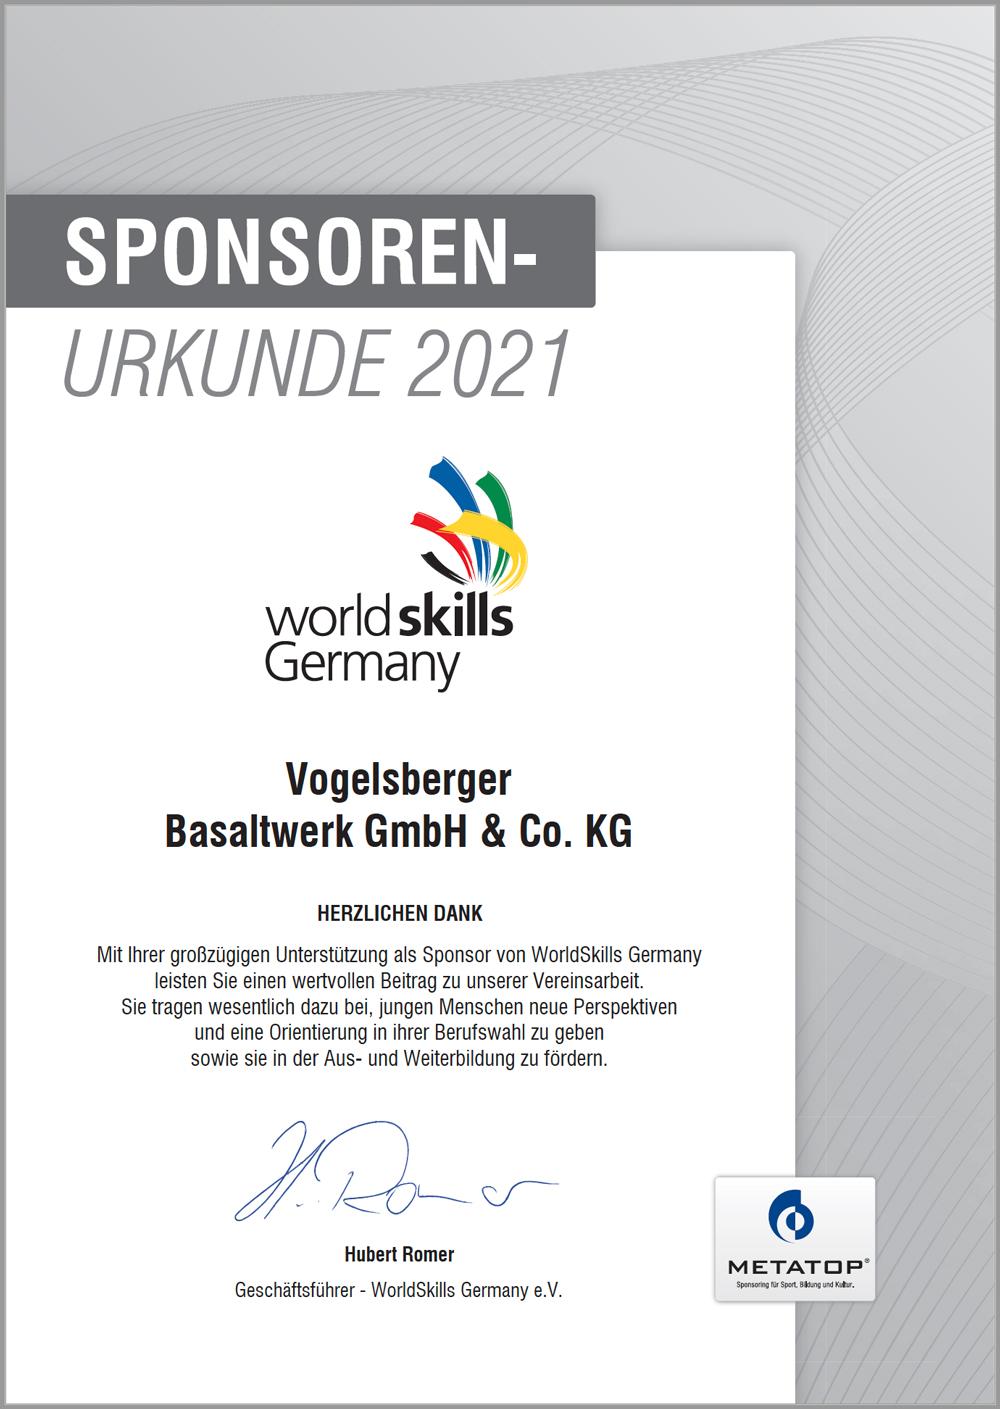 Sponsoren_Urkunde